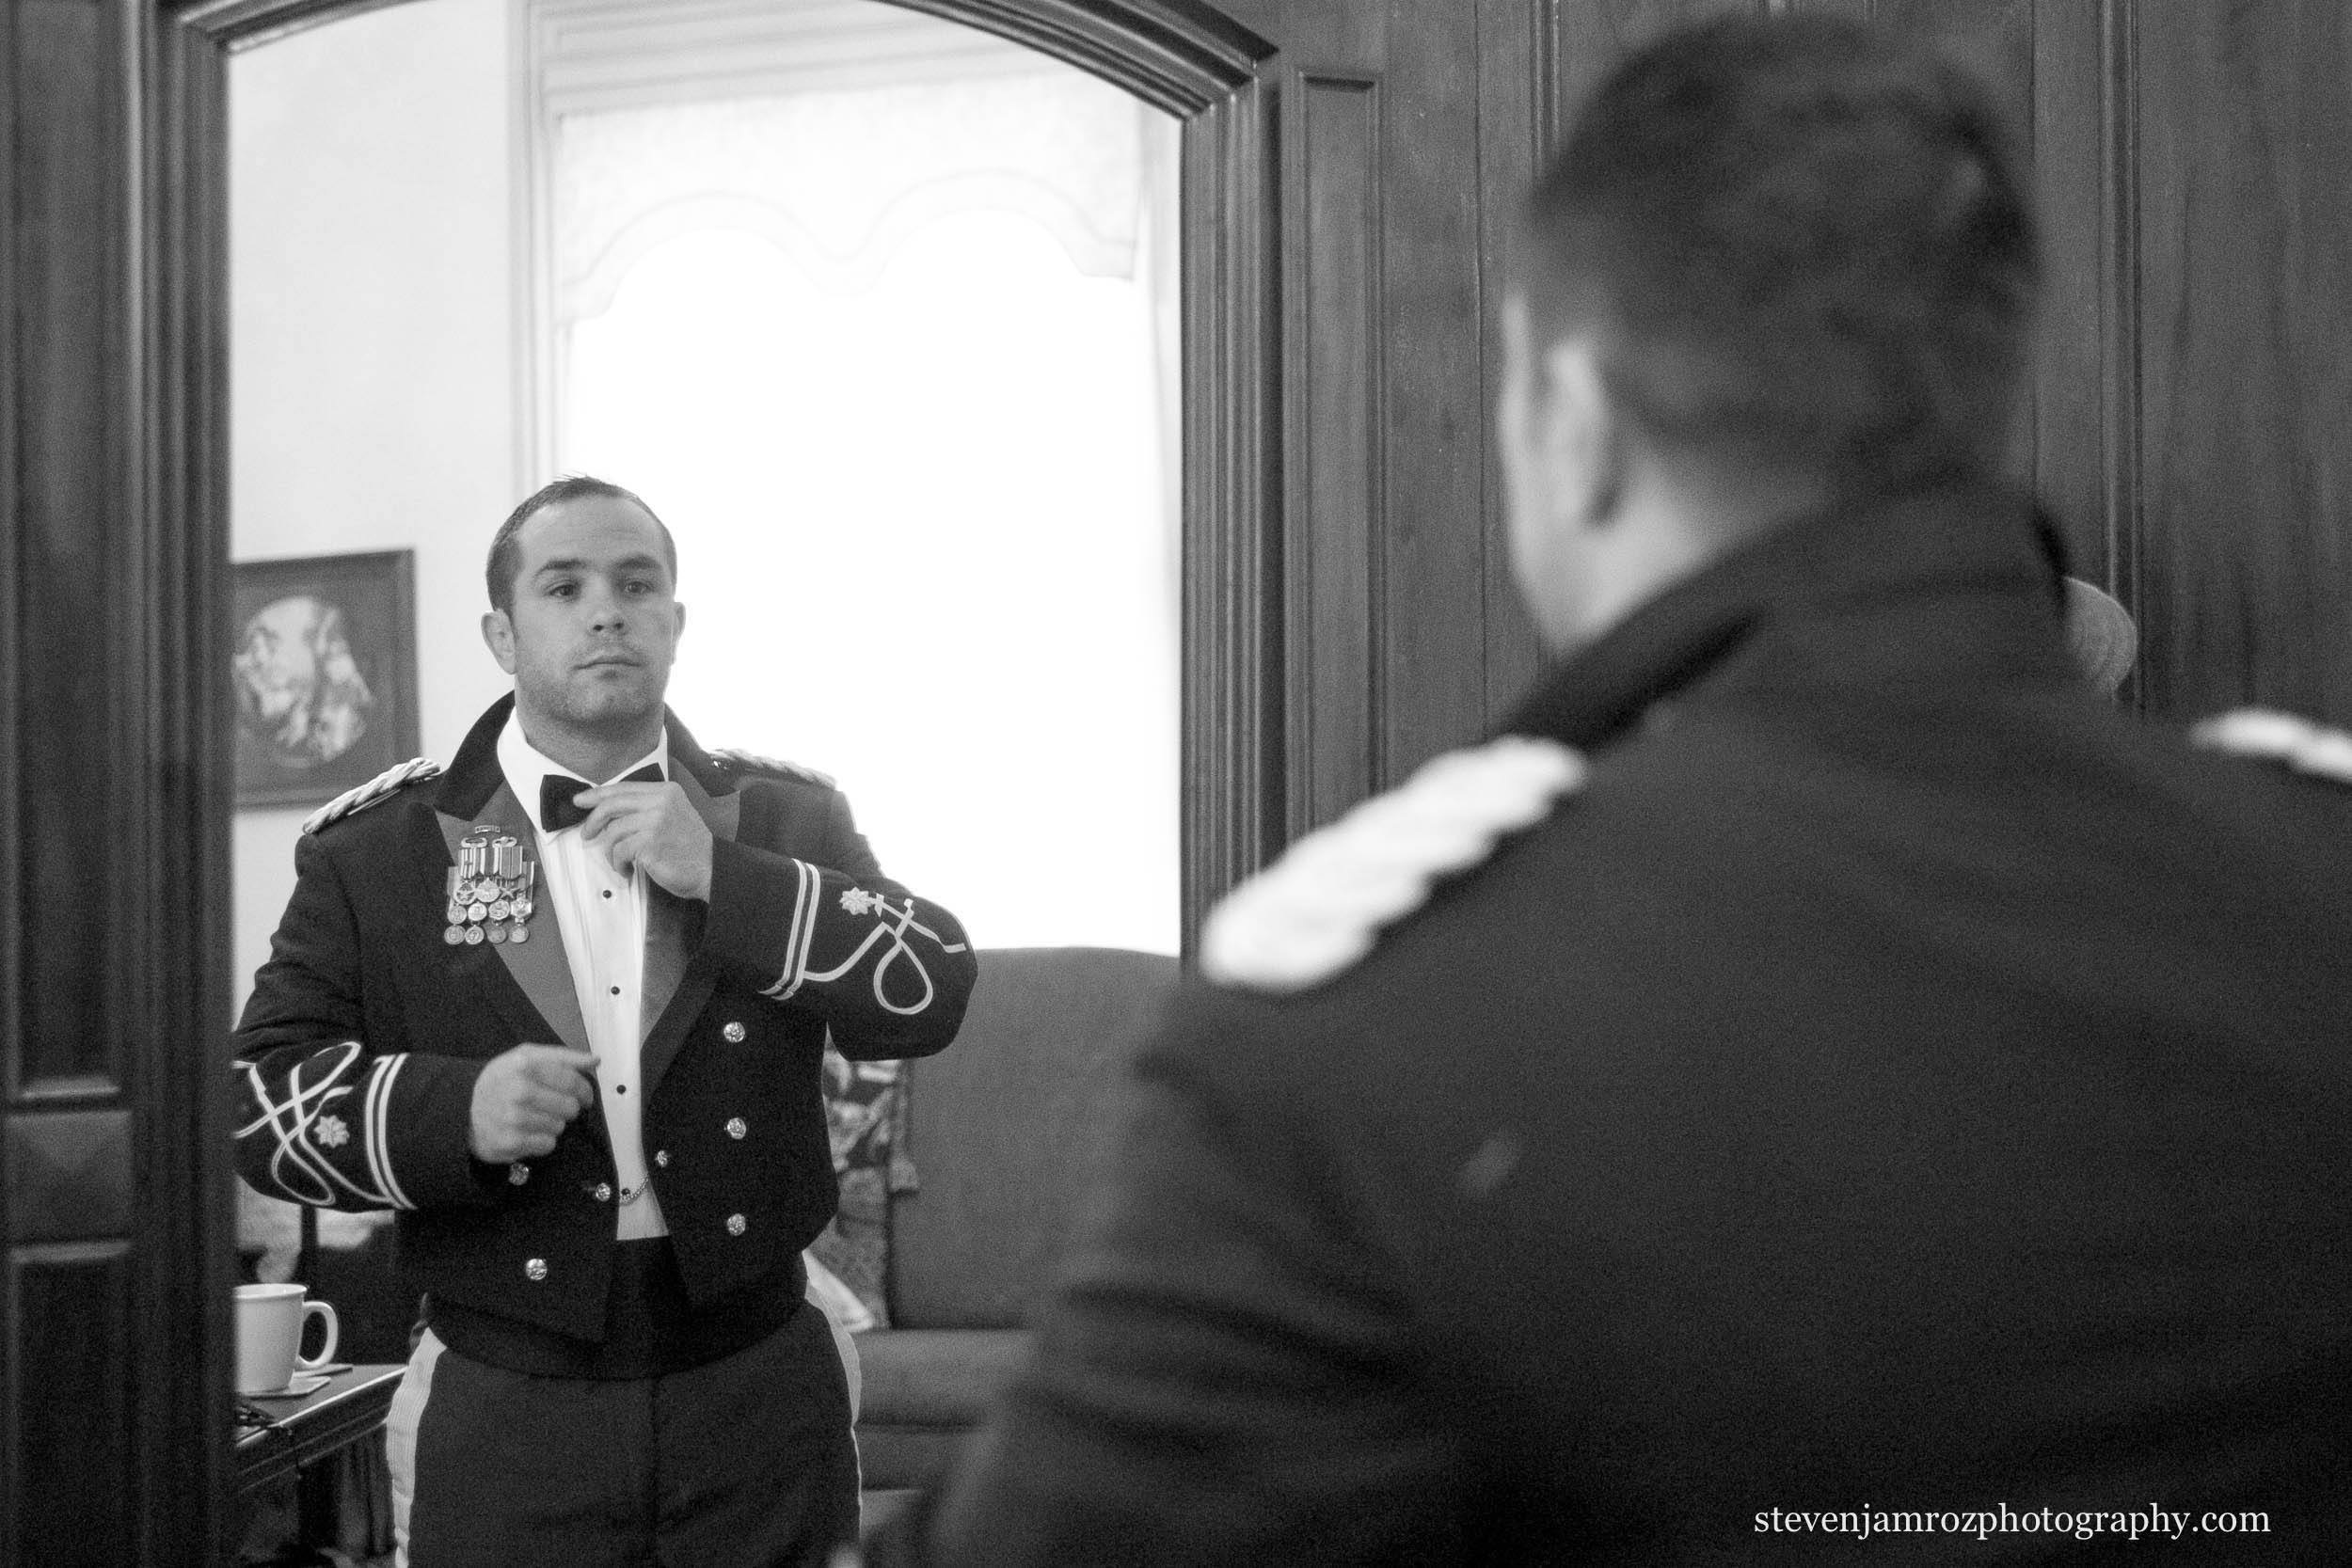 bowtie-adjust-mirror-military-wedding-nc-steven-jamroz-photography-0208.jpg